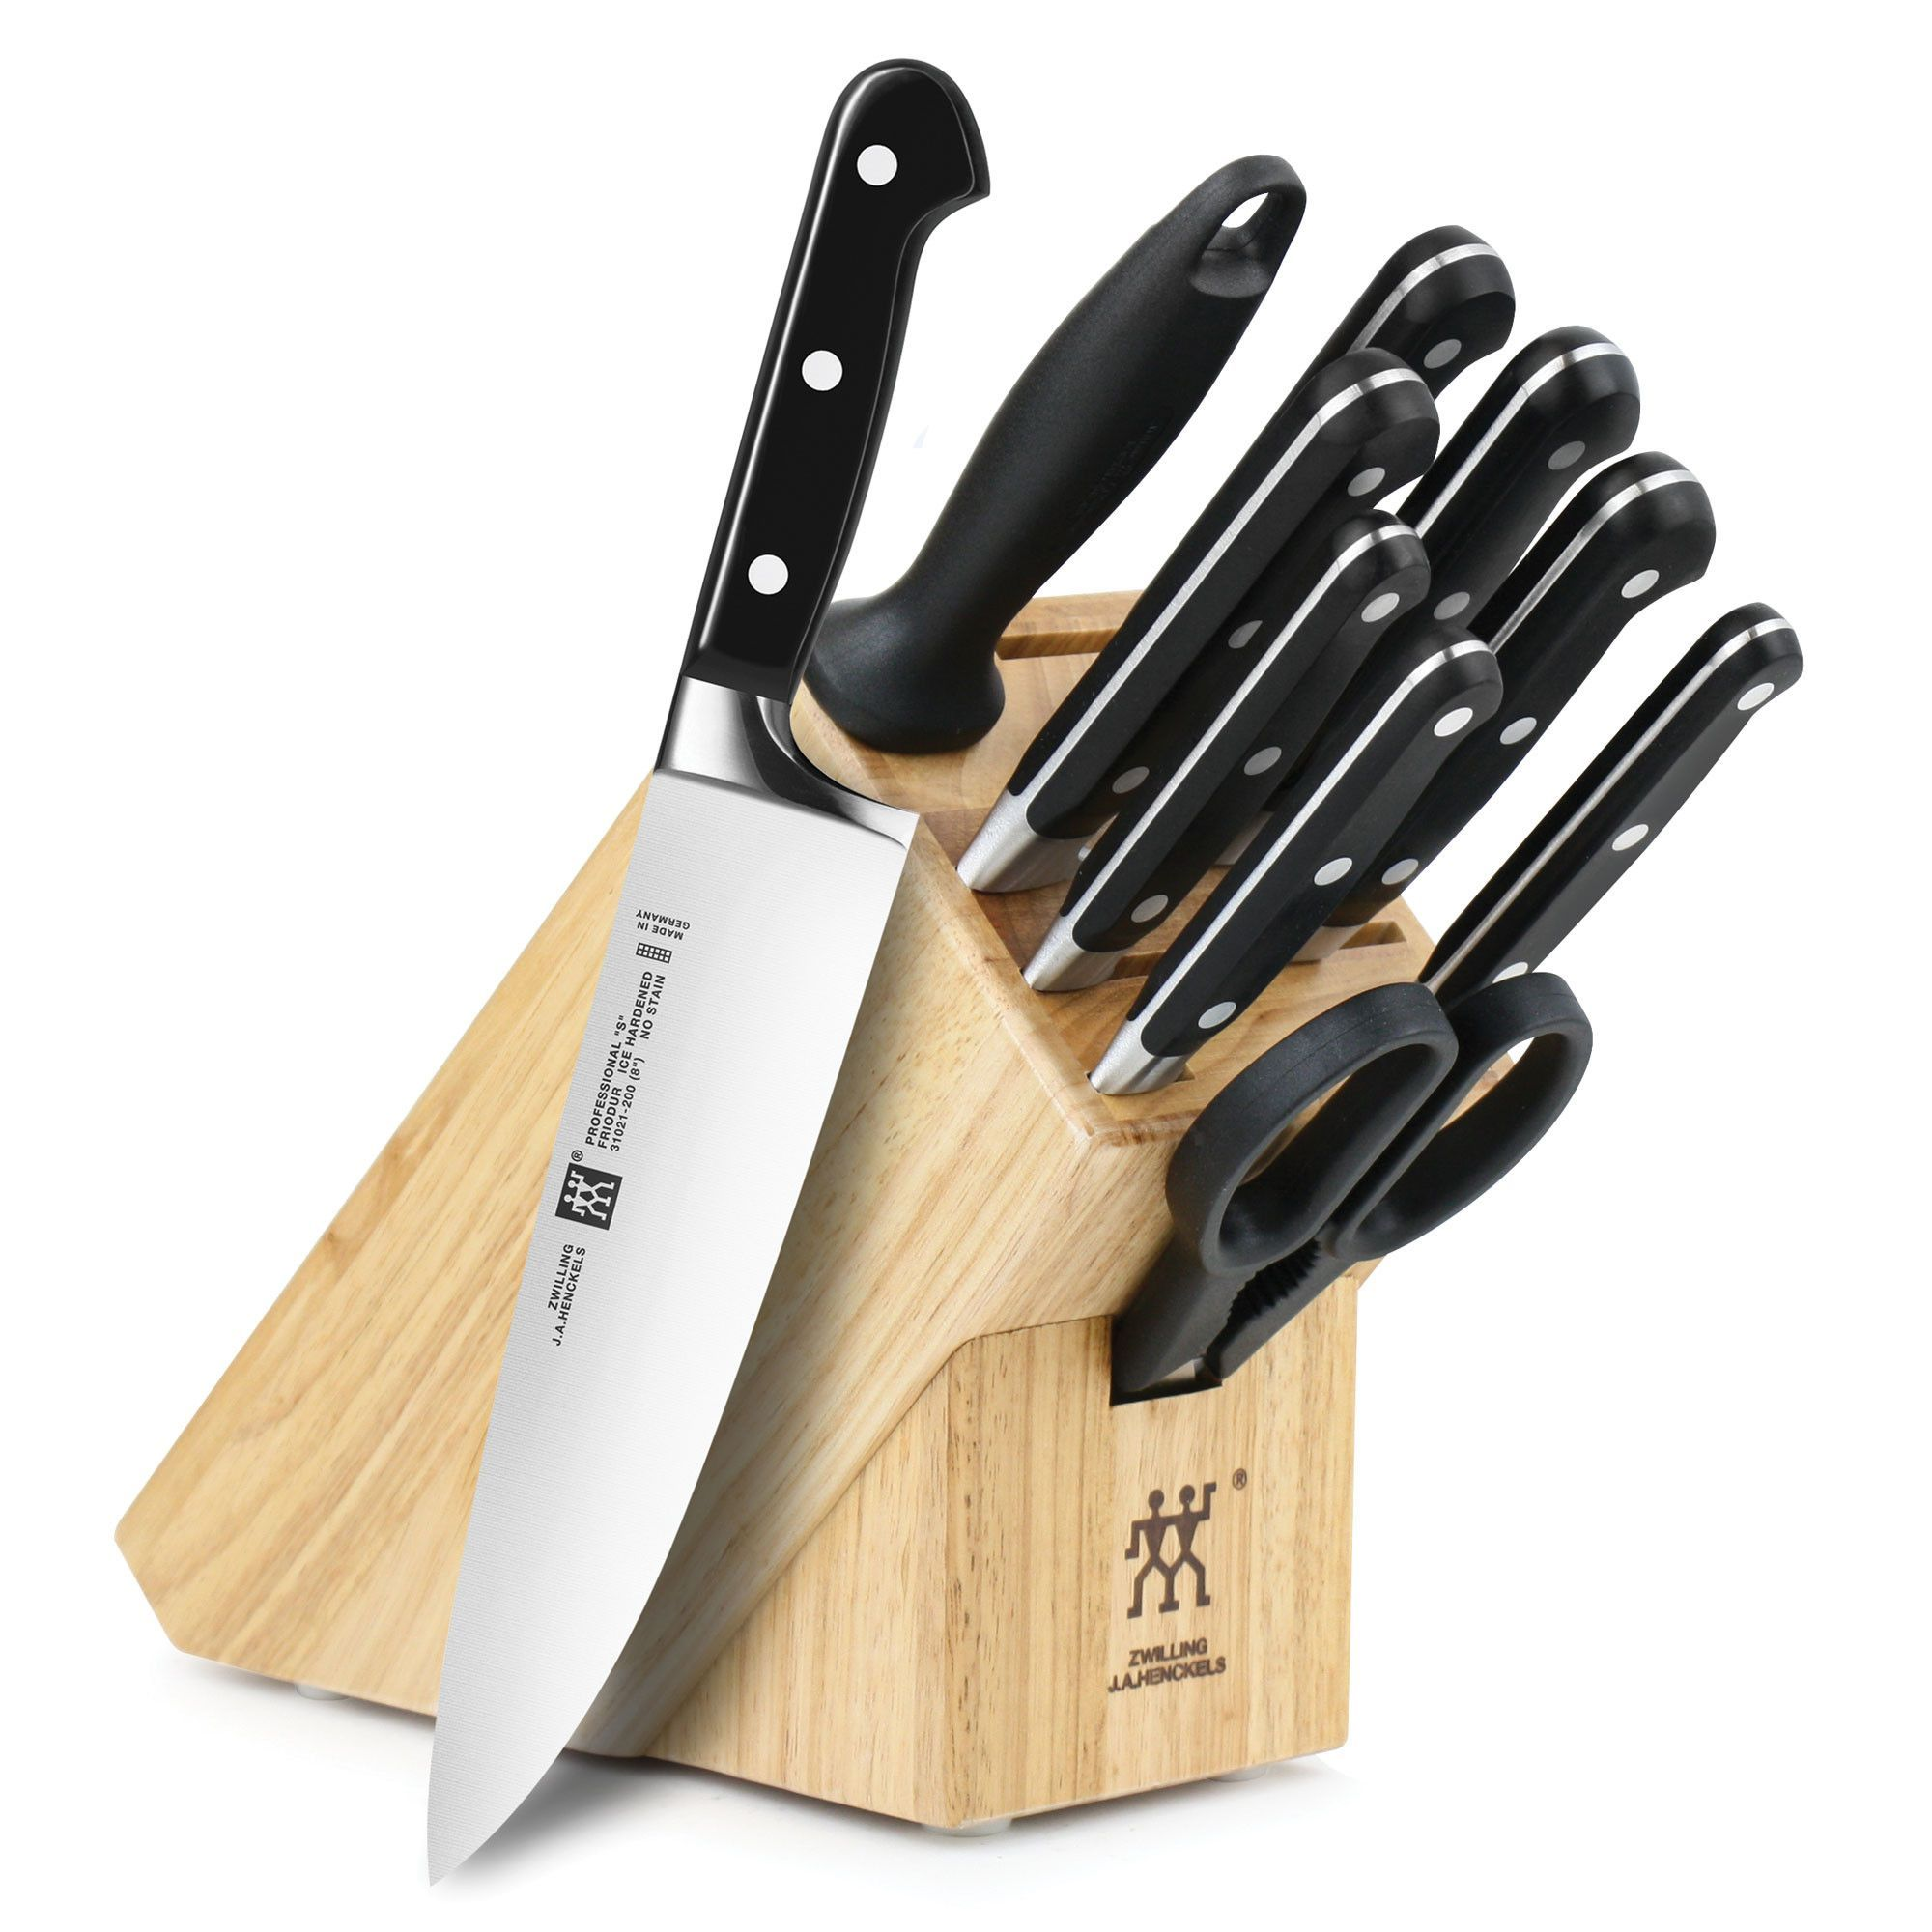 Zwilling ja henckels professional s piece knife block set